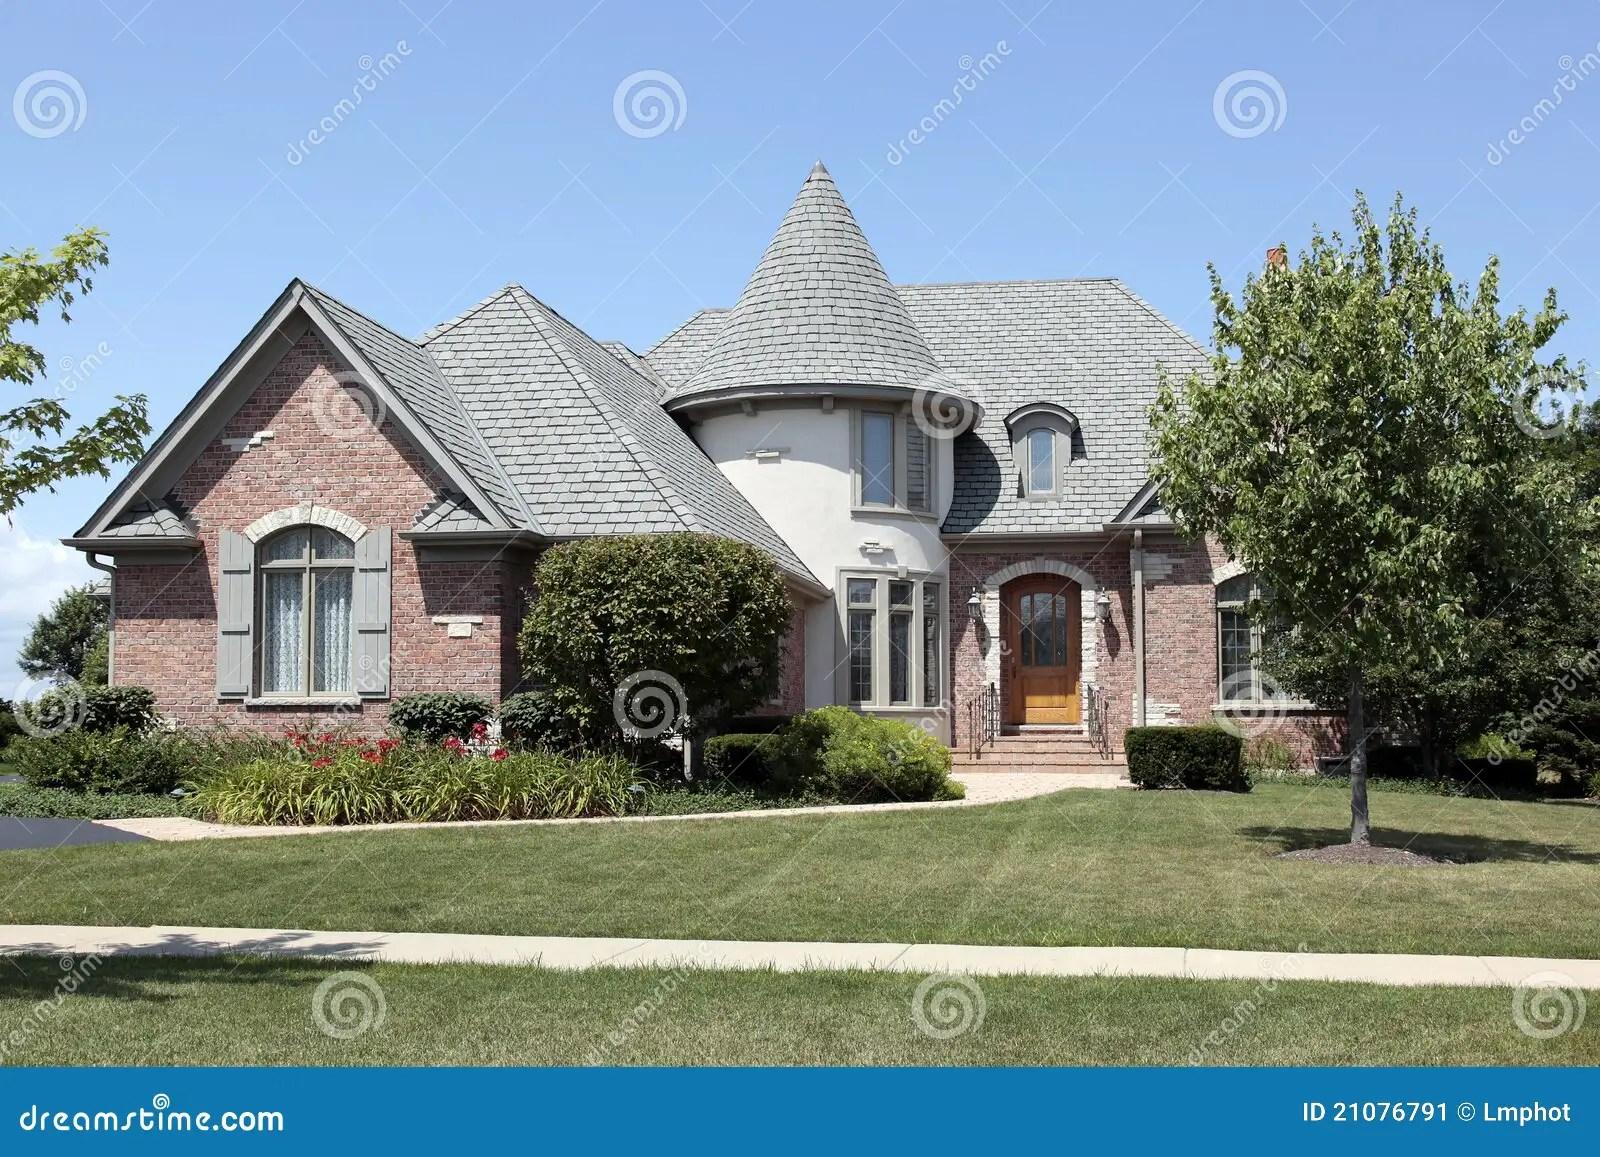 aura buy majestic turret house plans house plans turrets turret house plans house plan